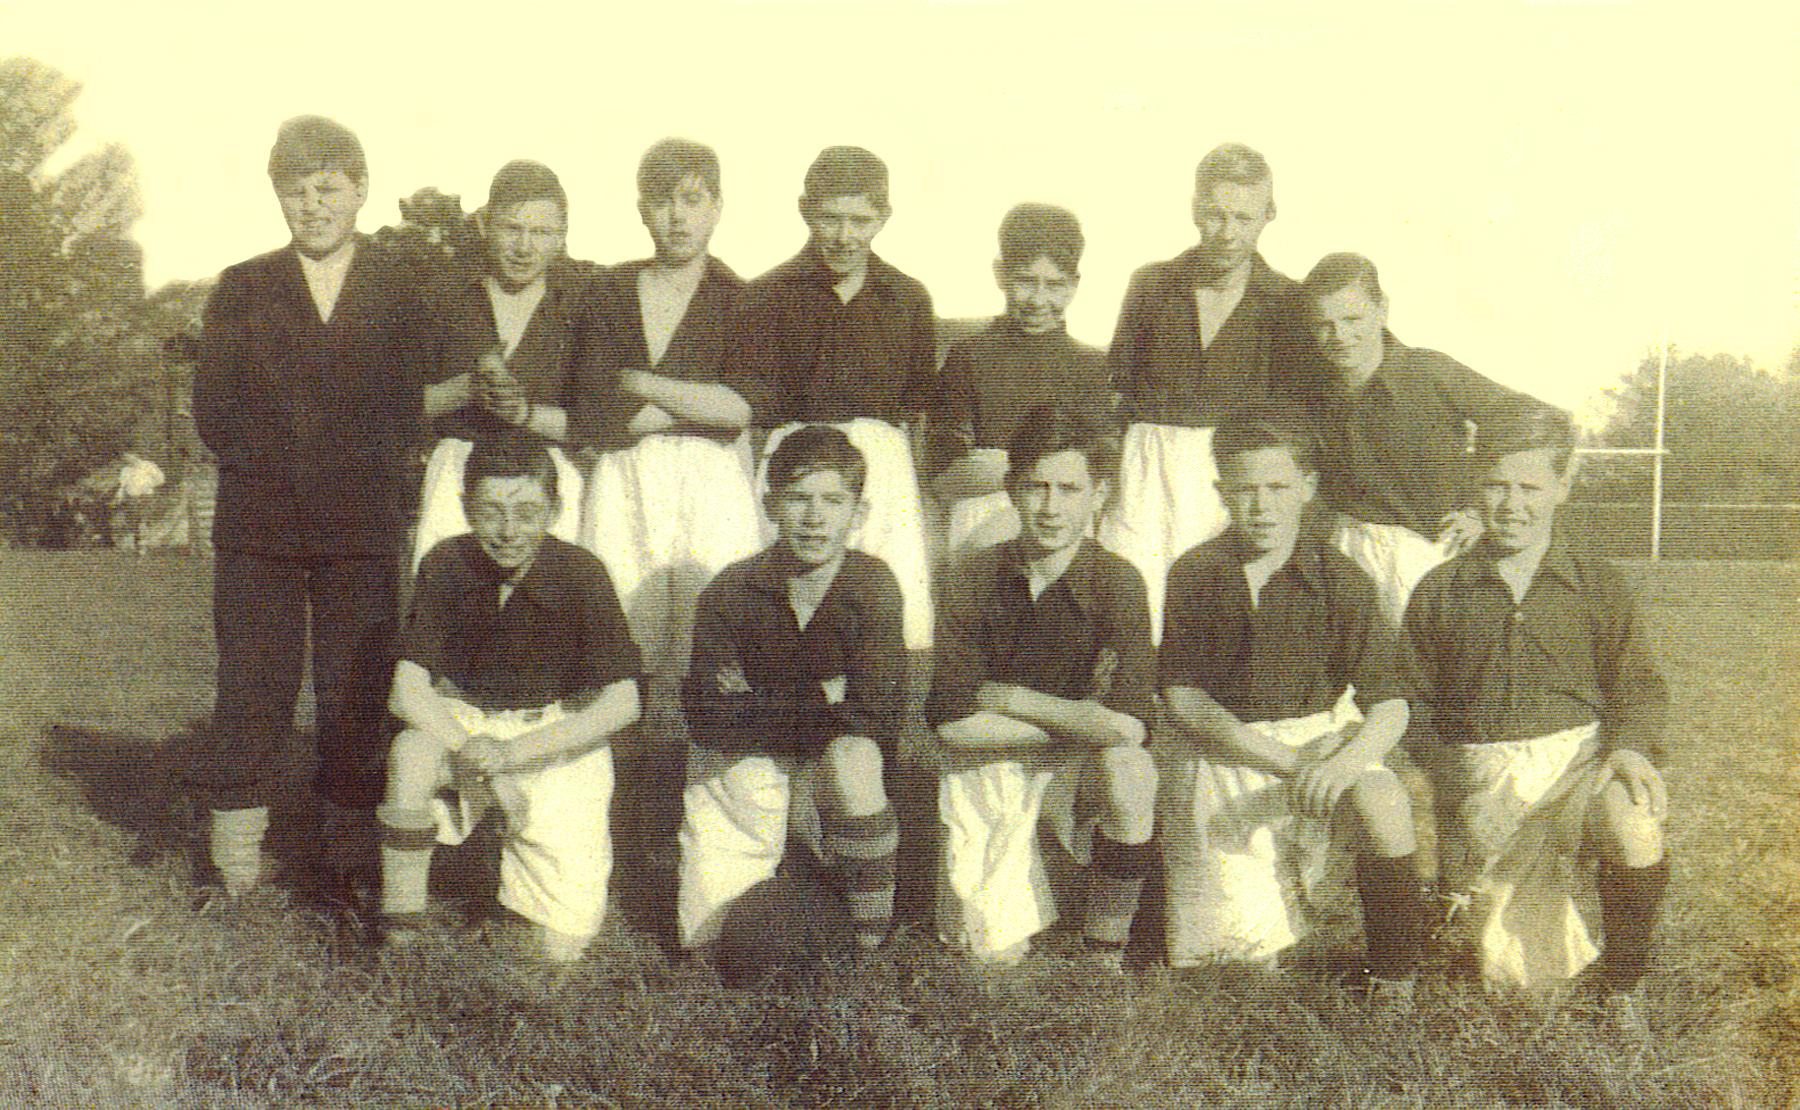 st-anthonys-boys-club-1946-47-1.jpg